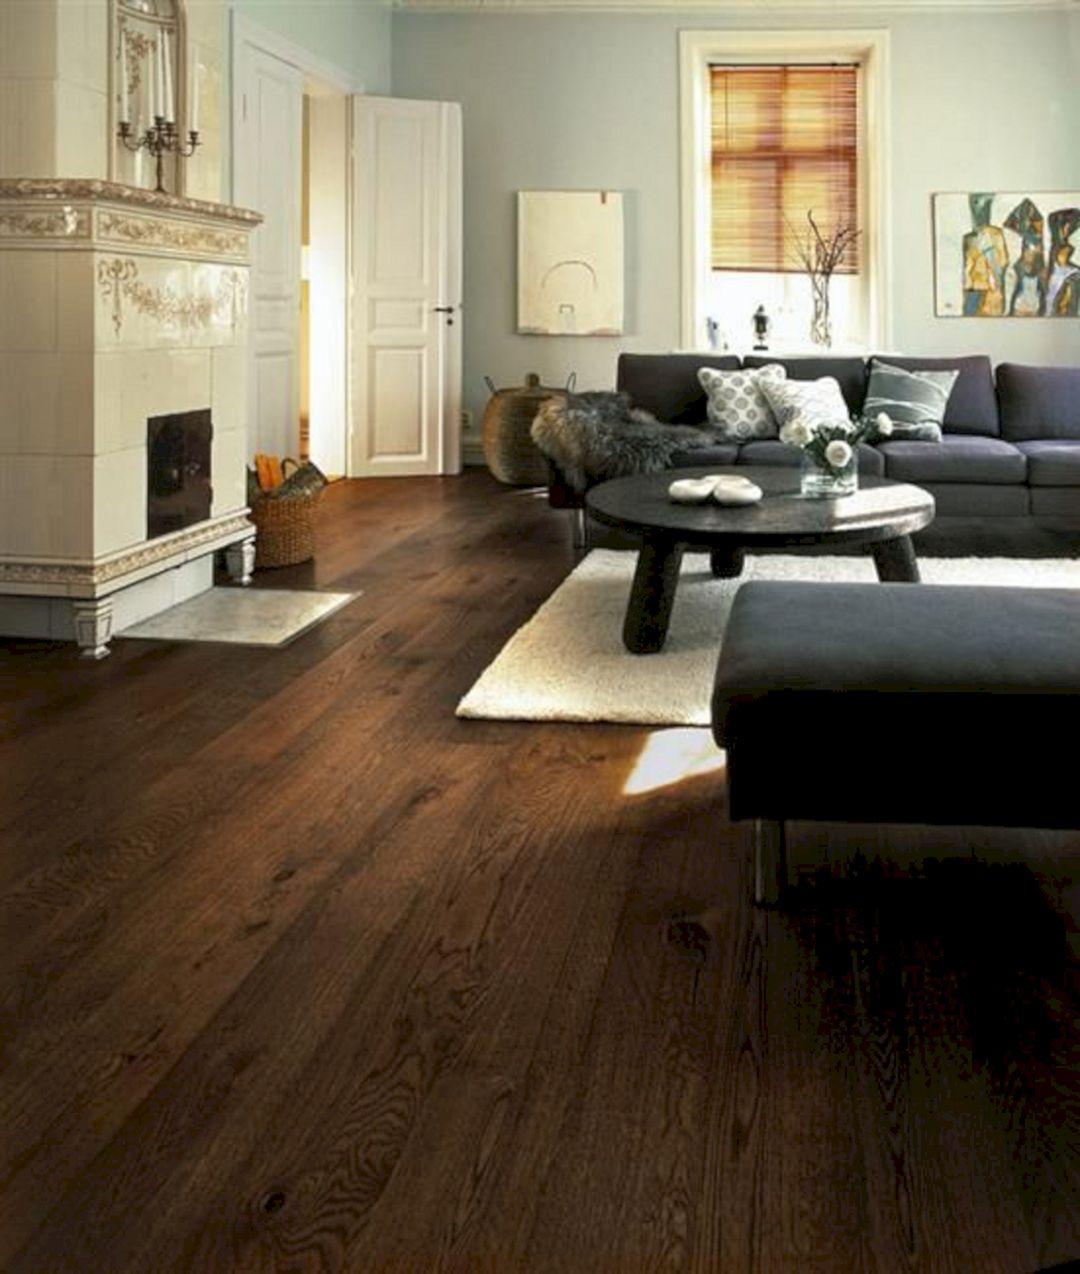 Living Room With Dark Wood Floors 80